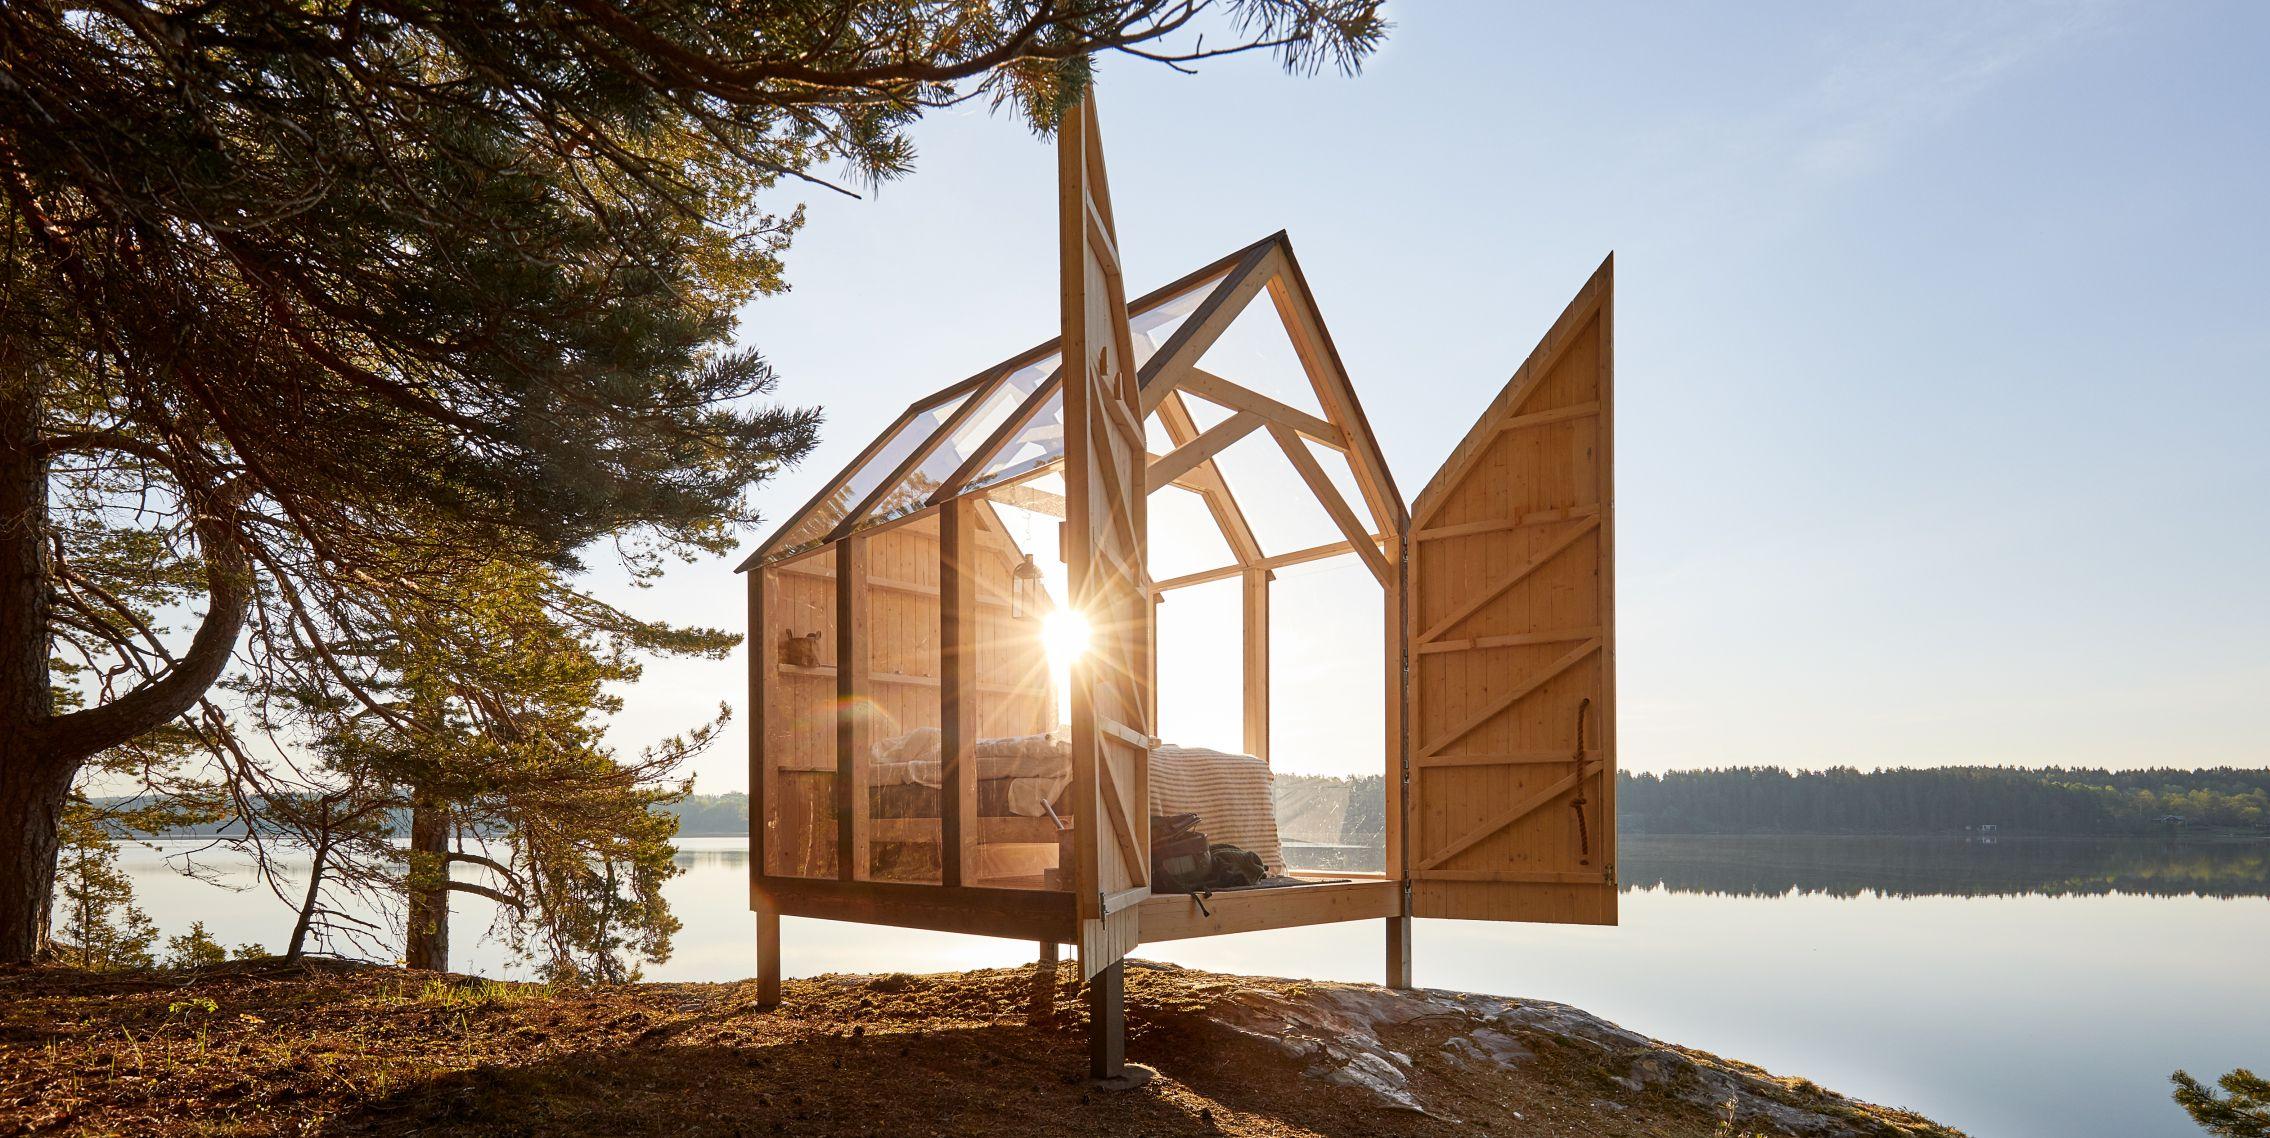 72 horas minicasa cabina en Suecia